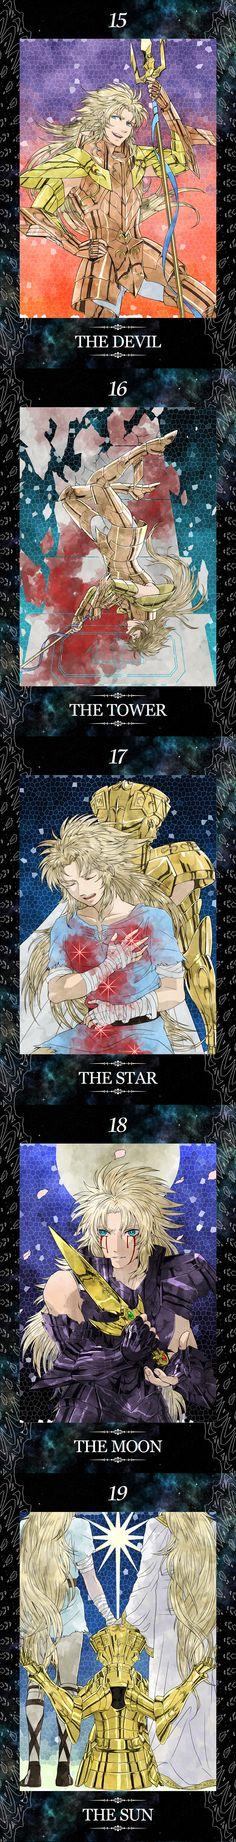 Part Four Saint Seiya Gemini Story Tarot Cards